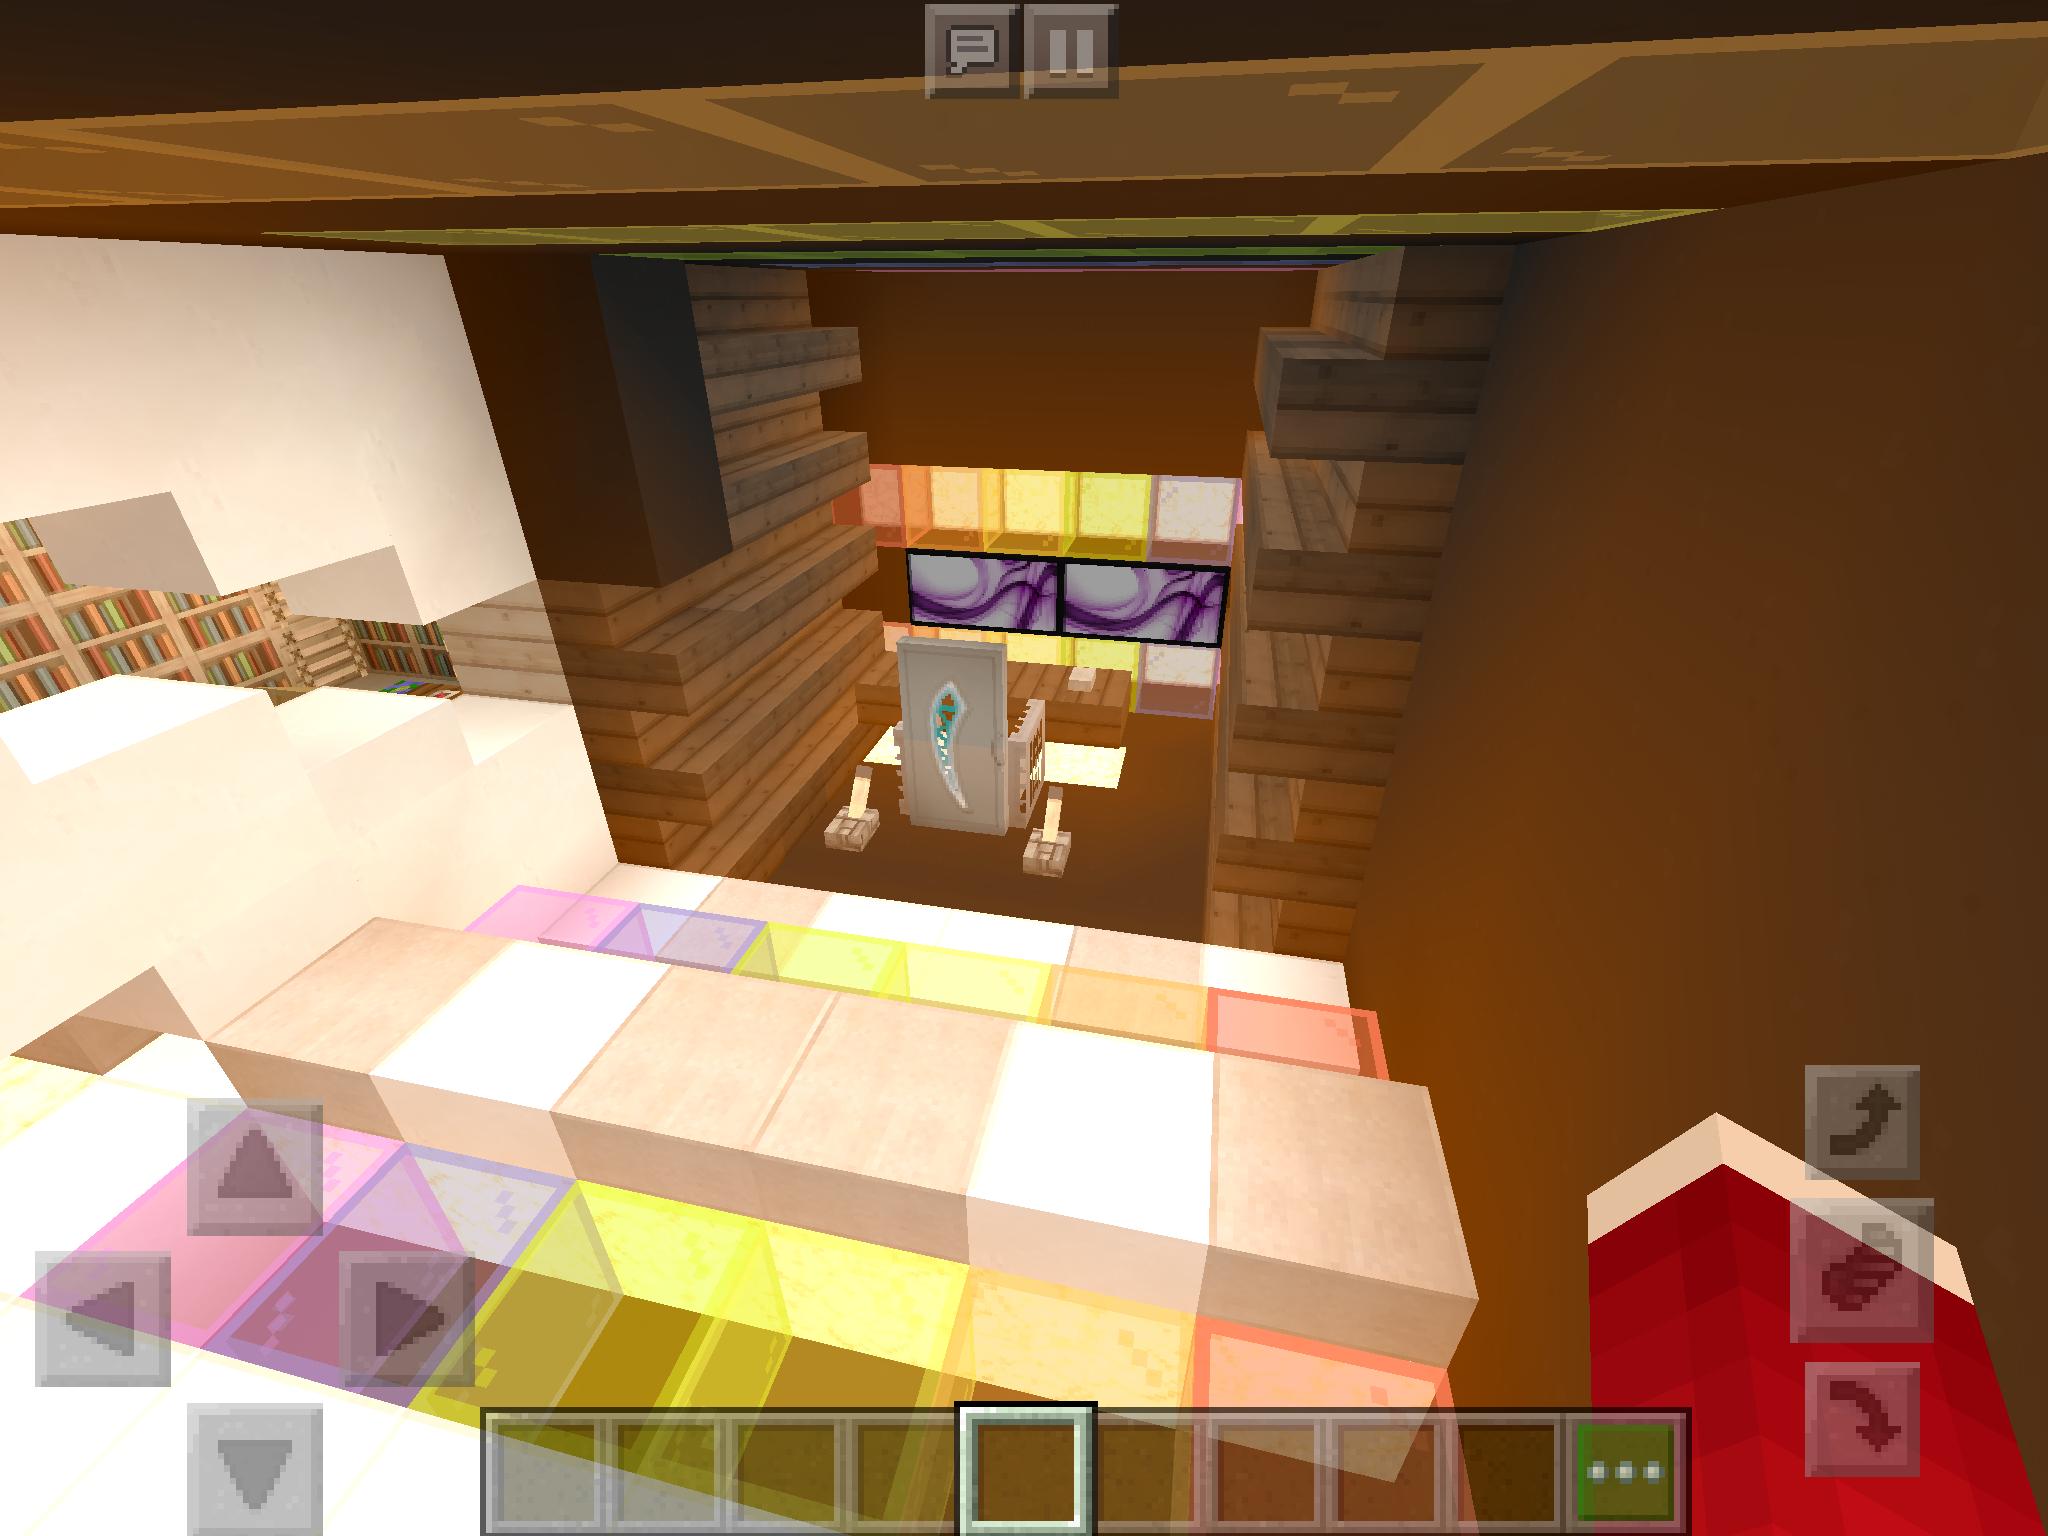 Rainbow Gaming Room Minecraft Game Room Fun Slide Fun